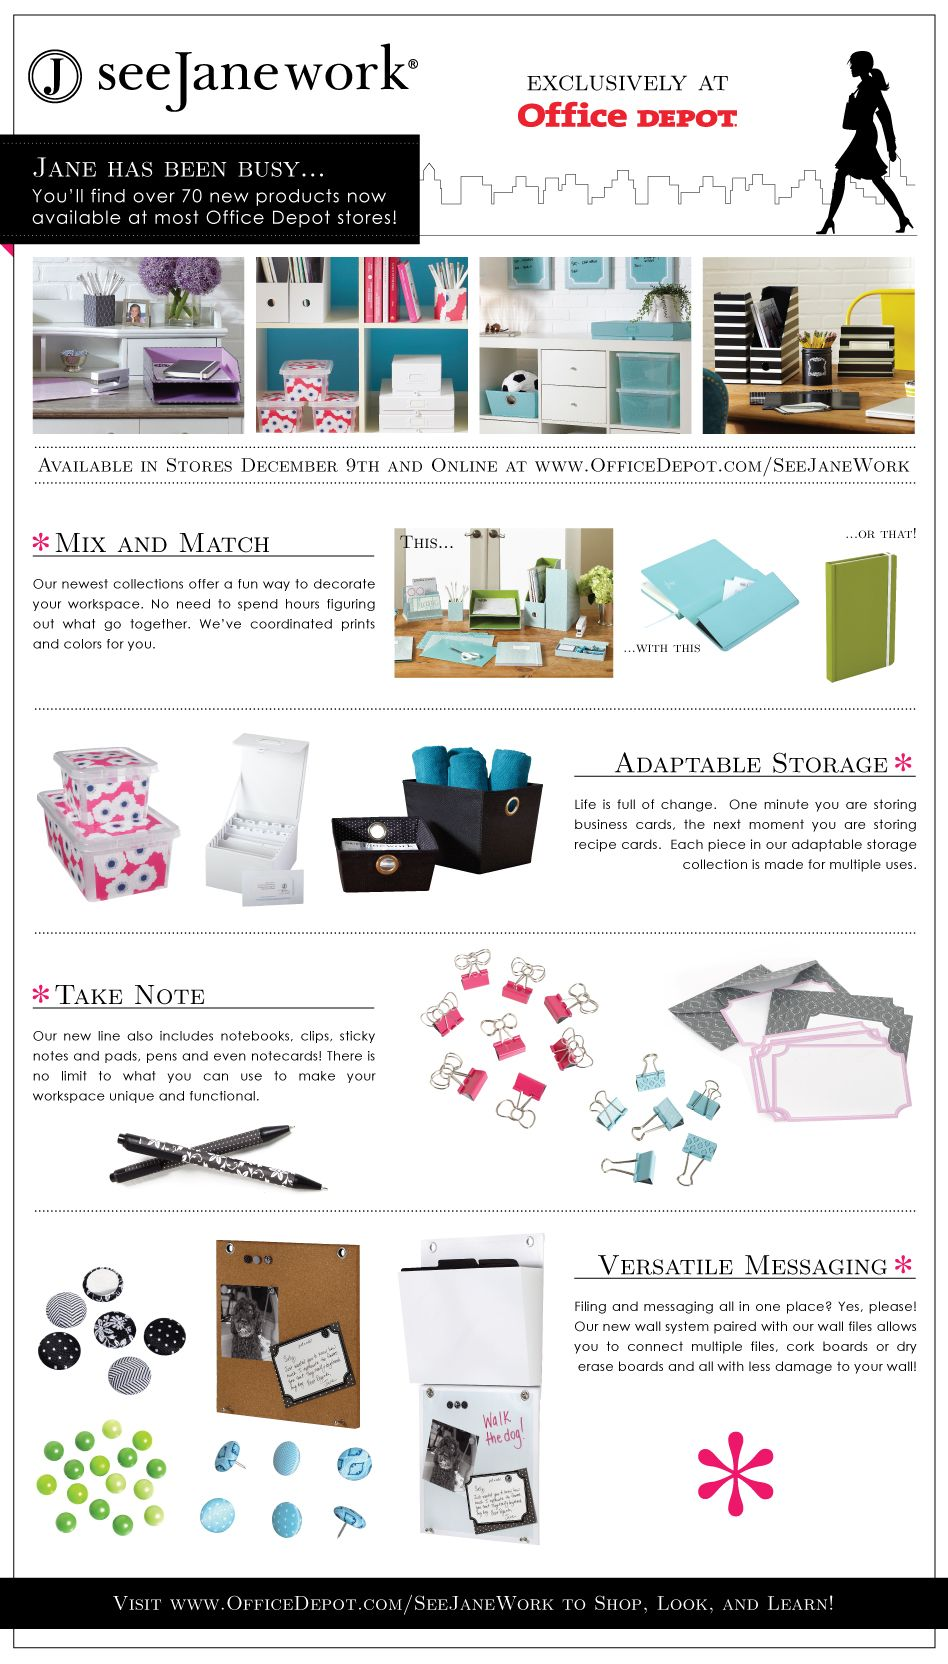 Seejanework: Office Supplies- See Jane Work